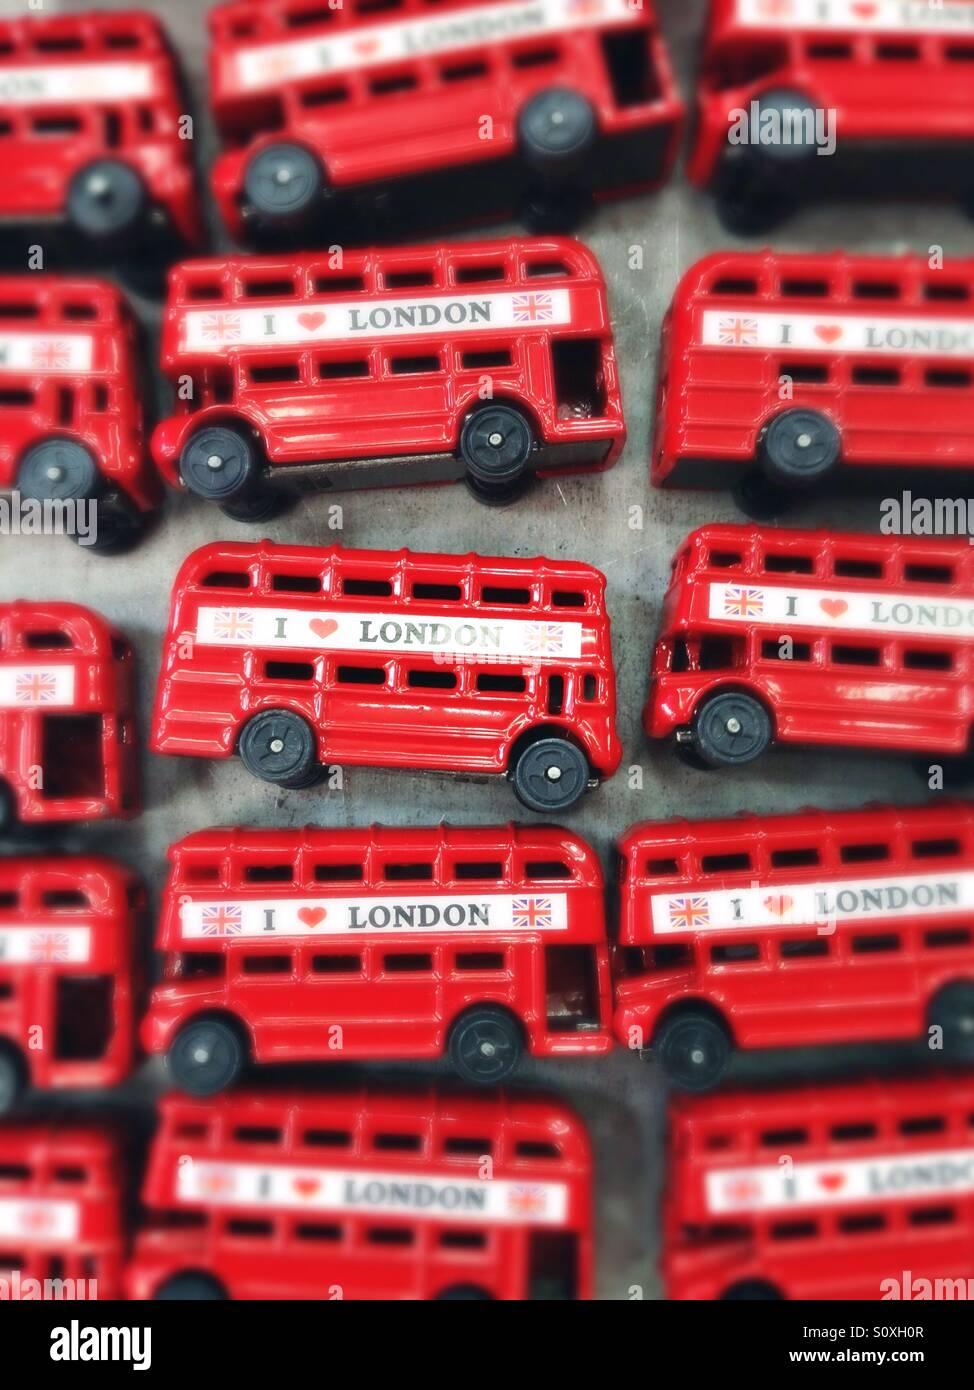 Rote Busse verkauft als Andenken in Camden Town, London, UK Stockbild